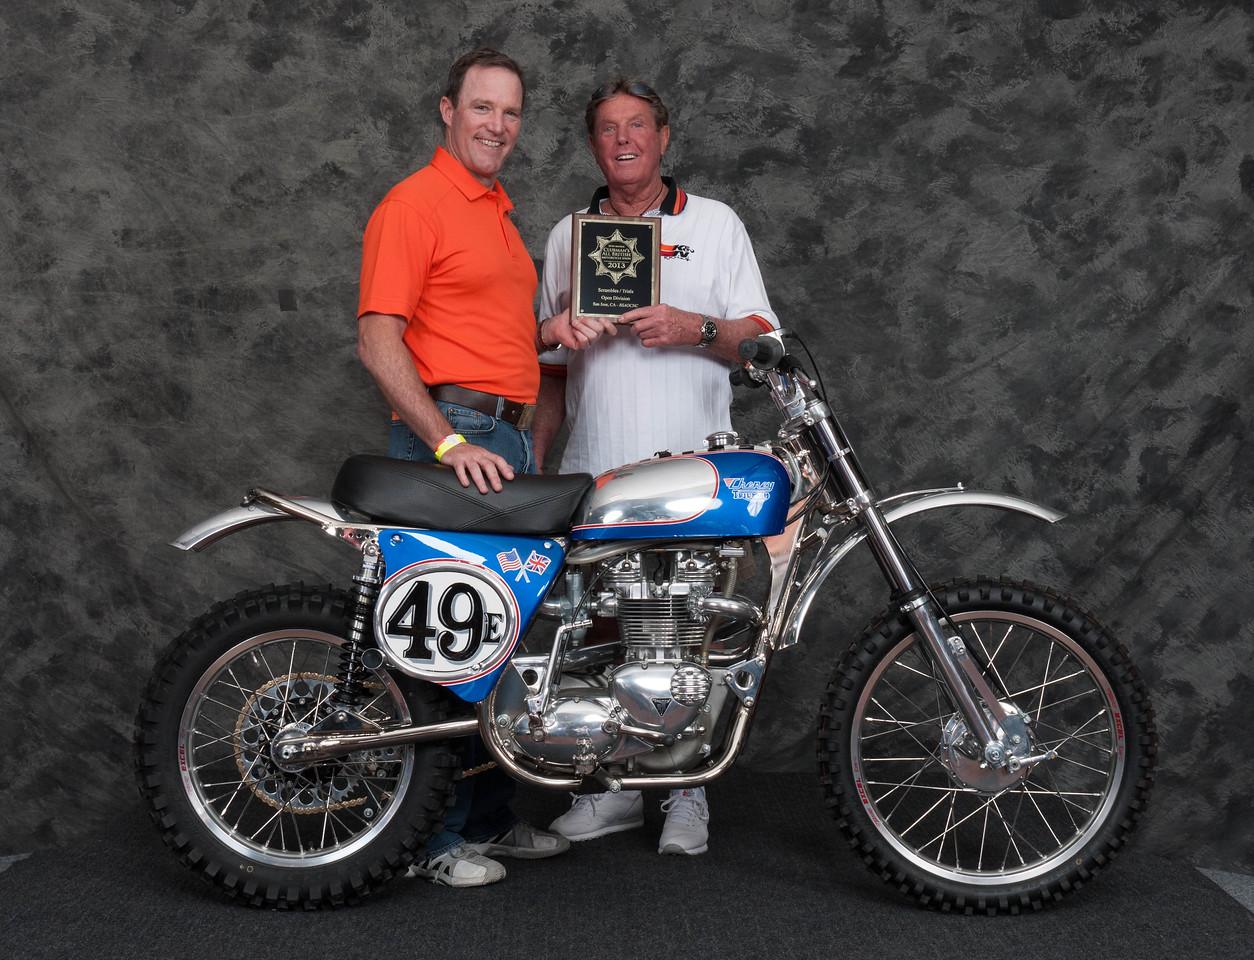 Steve Brinkman, Winner of Scrambles / Trials Open Class - 1969 Triumph - Cheney Triumph 800